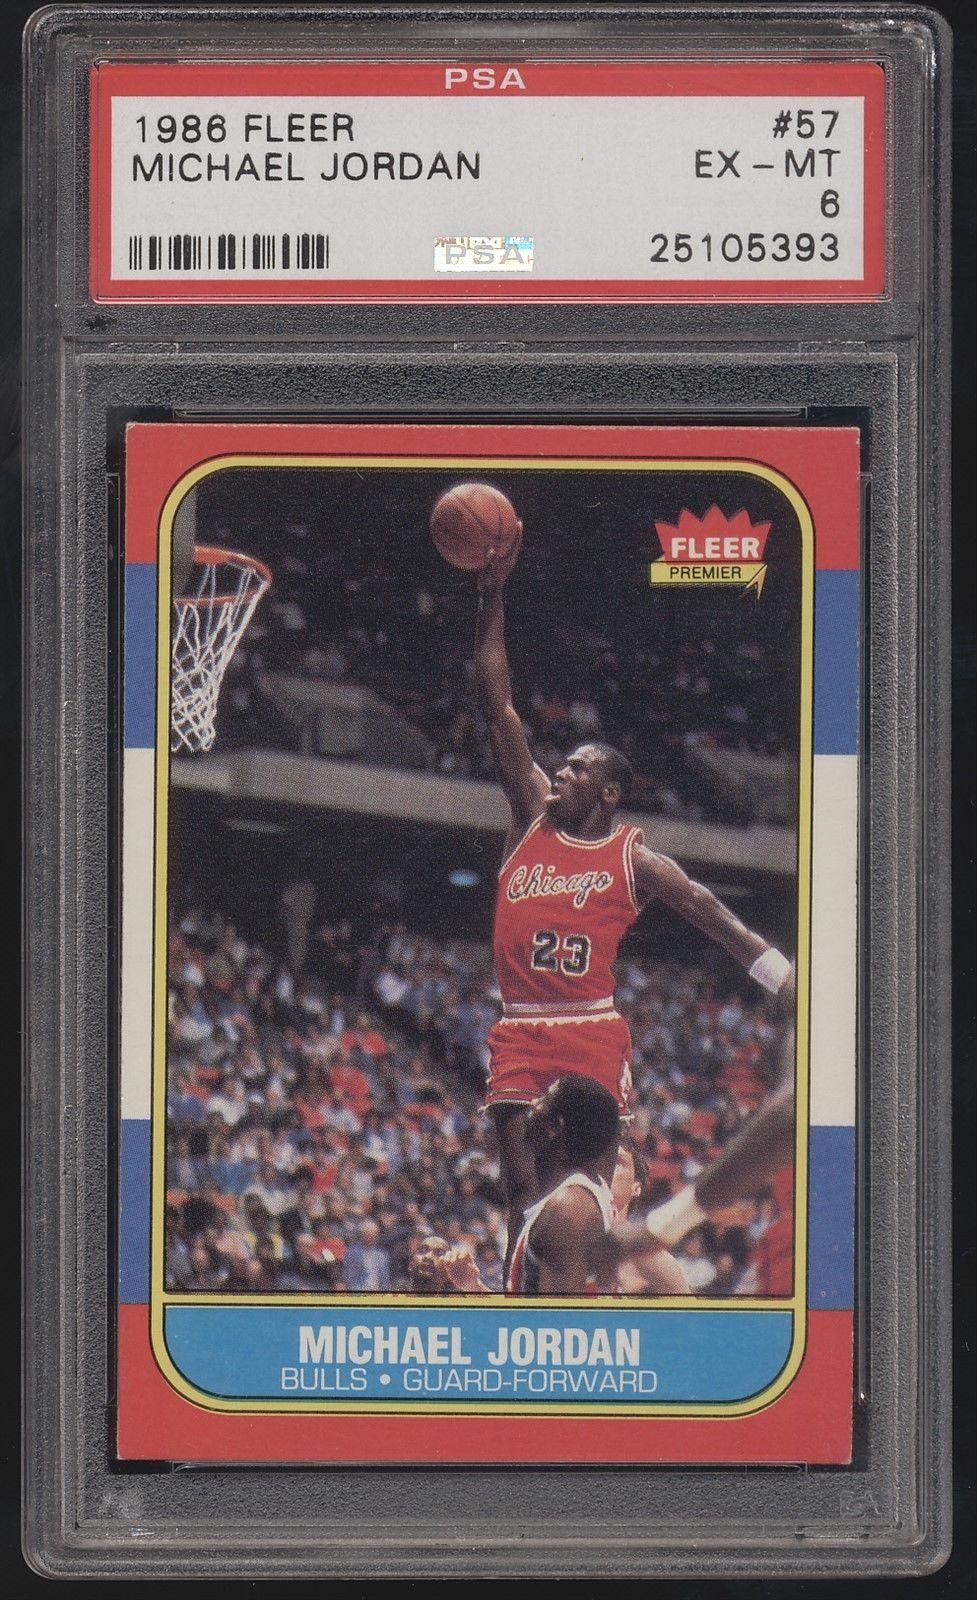 198687 Fleer 57 Michael Jordan Bulls RC Rookie PSA 6 EXMT